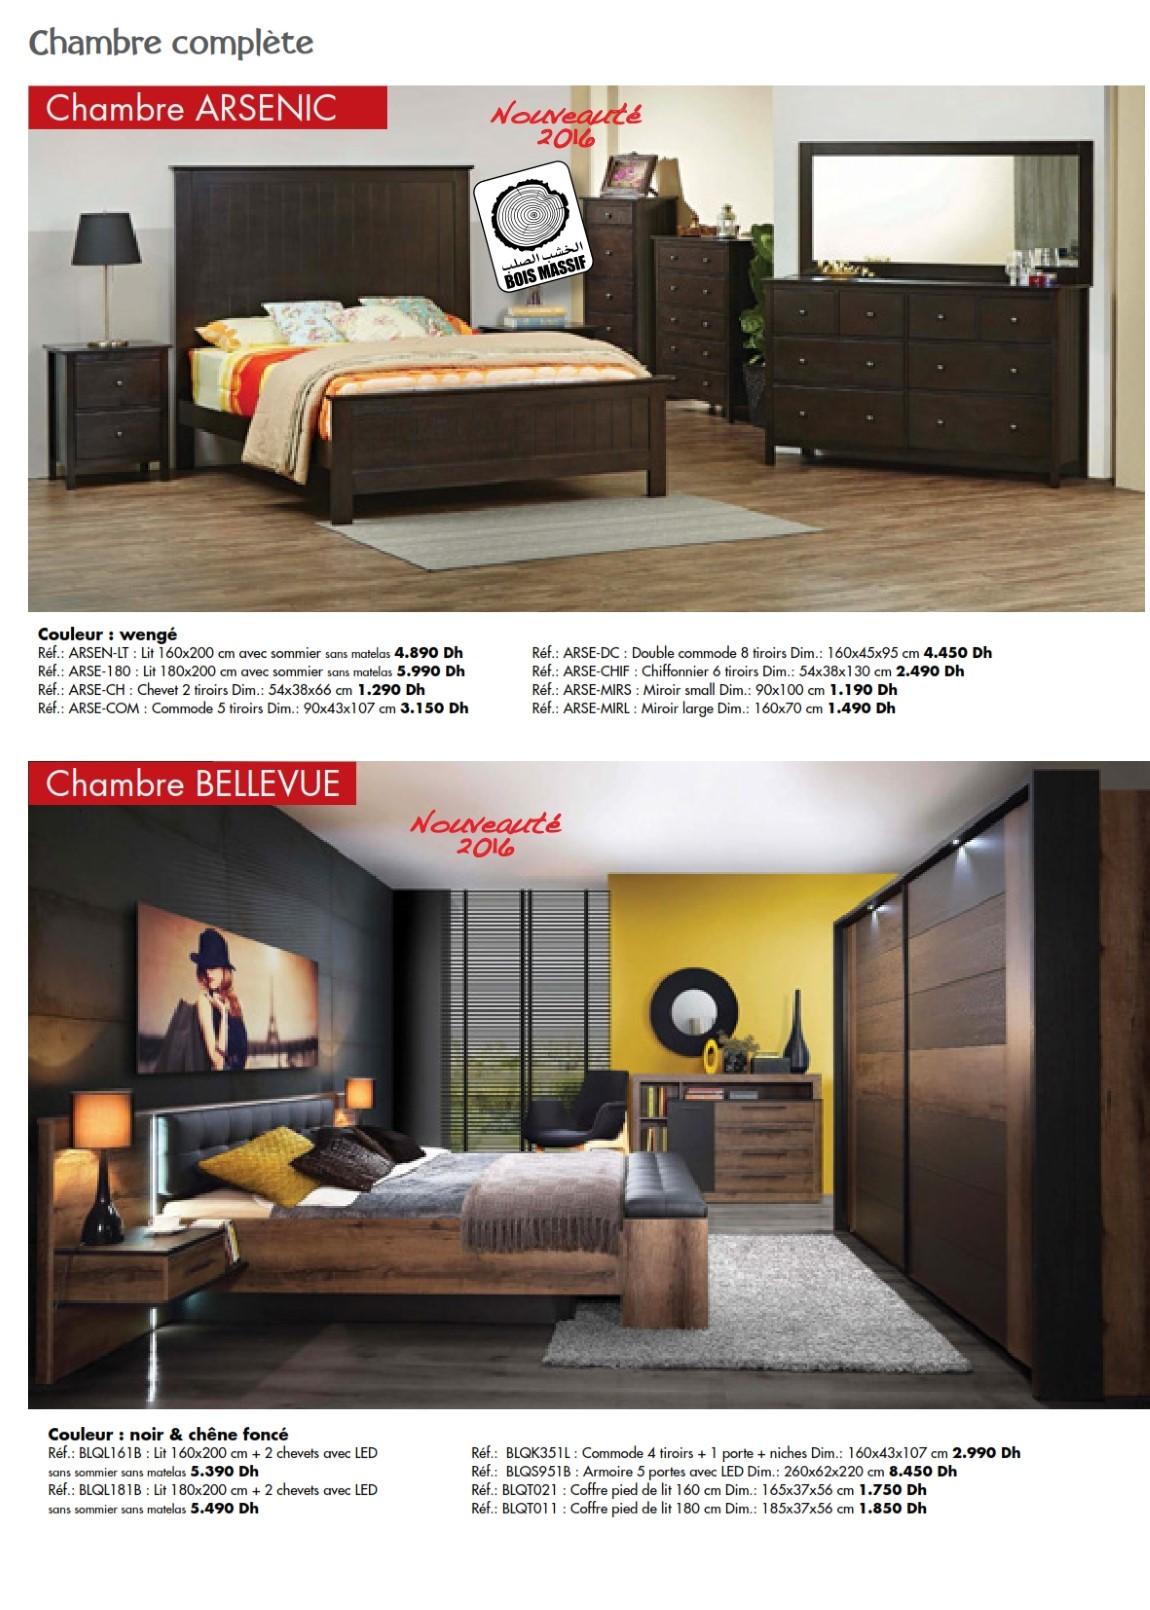 chambre-coucher-2016_012